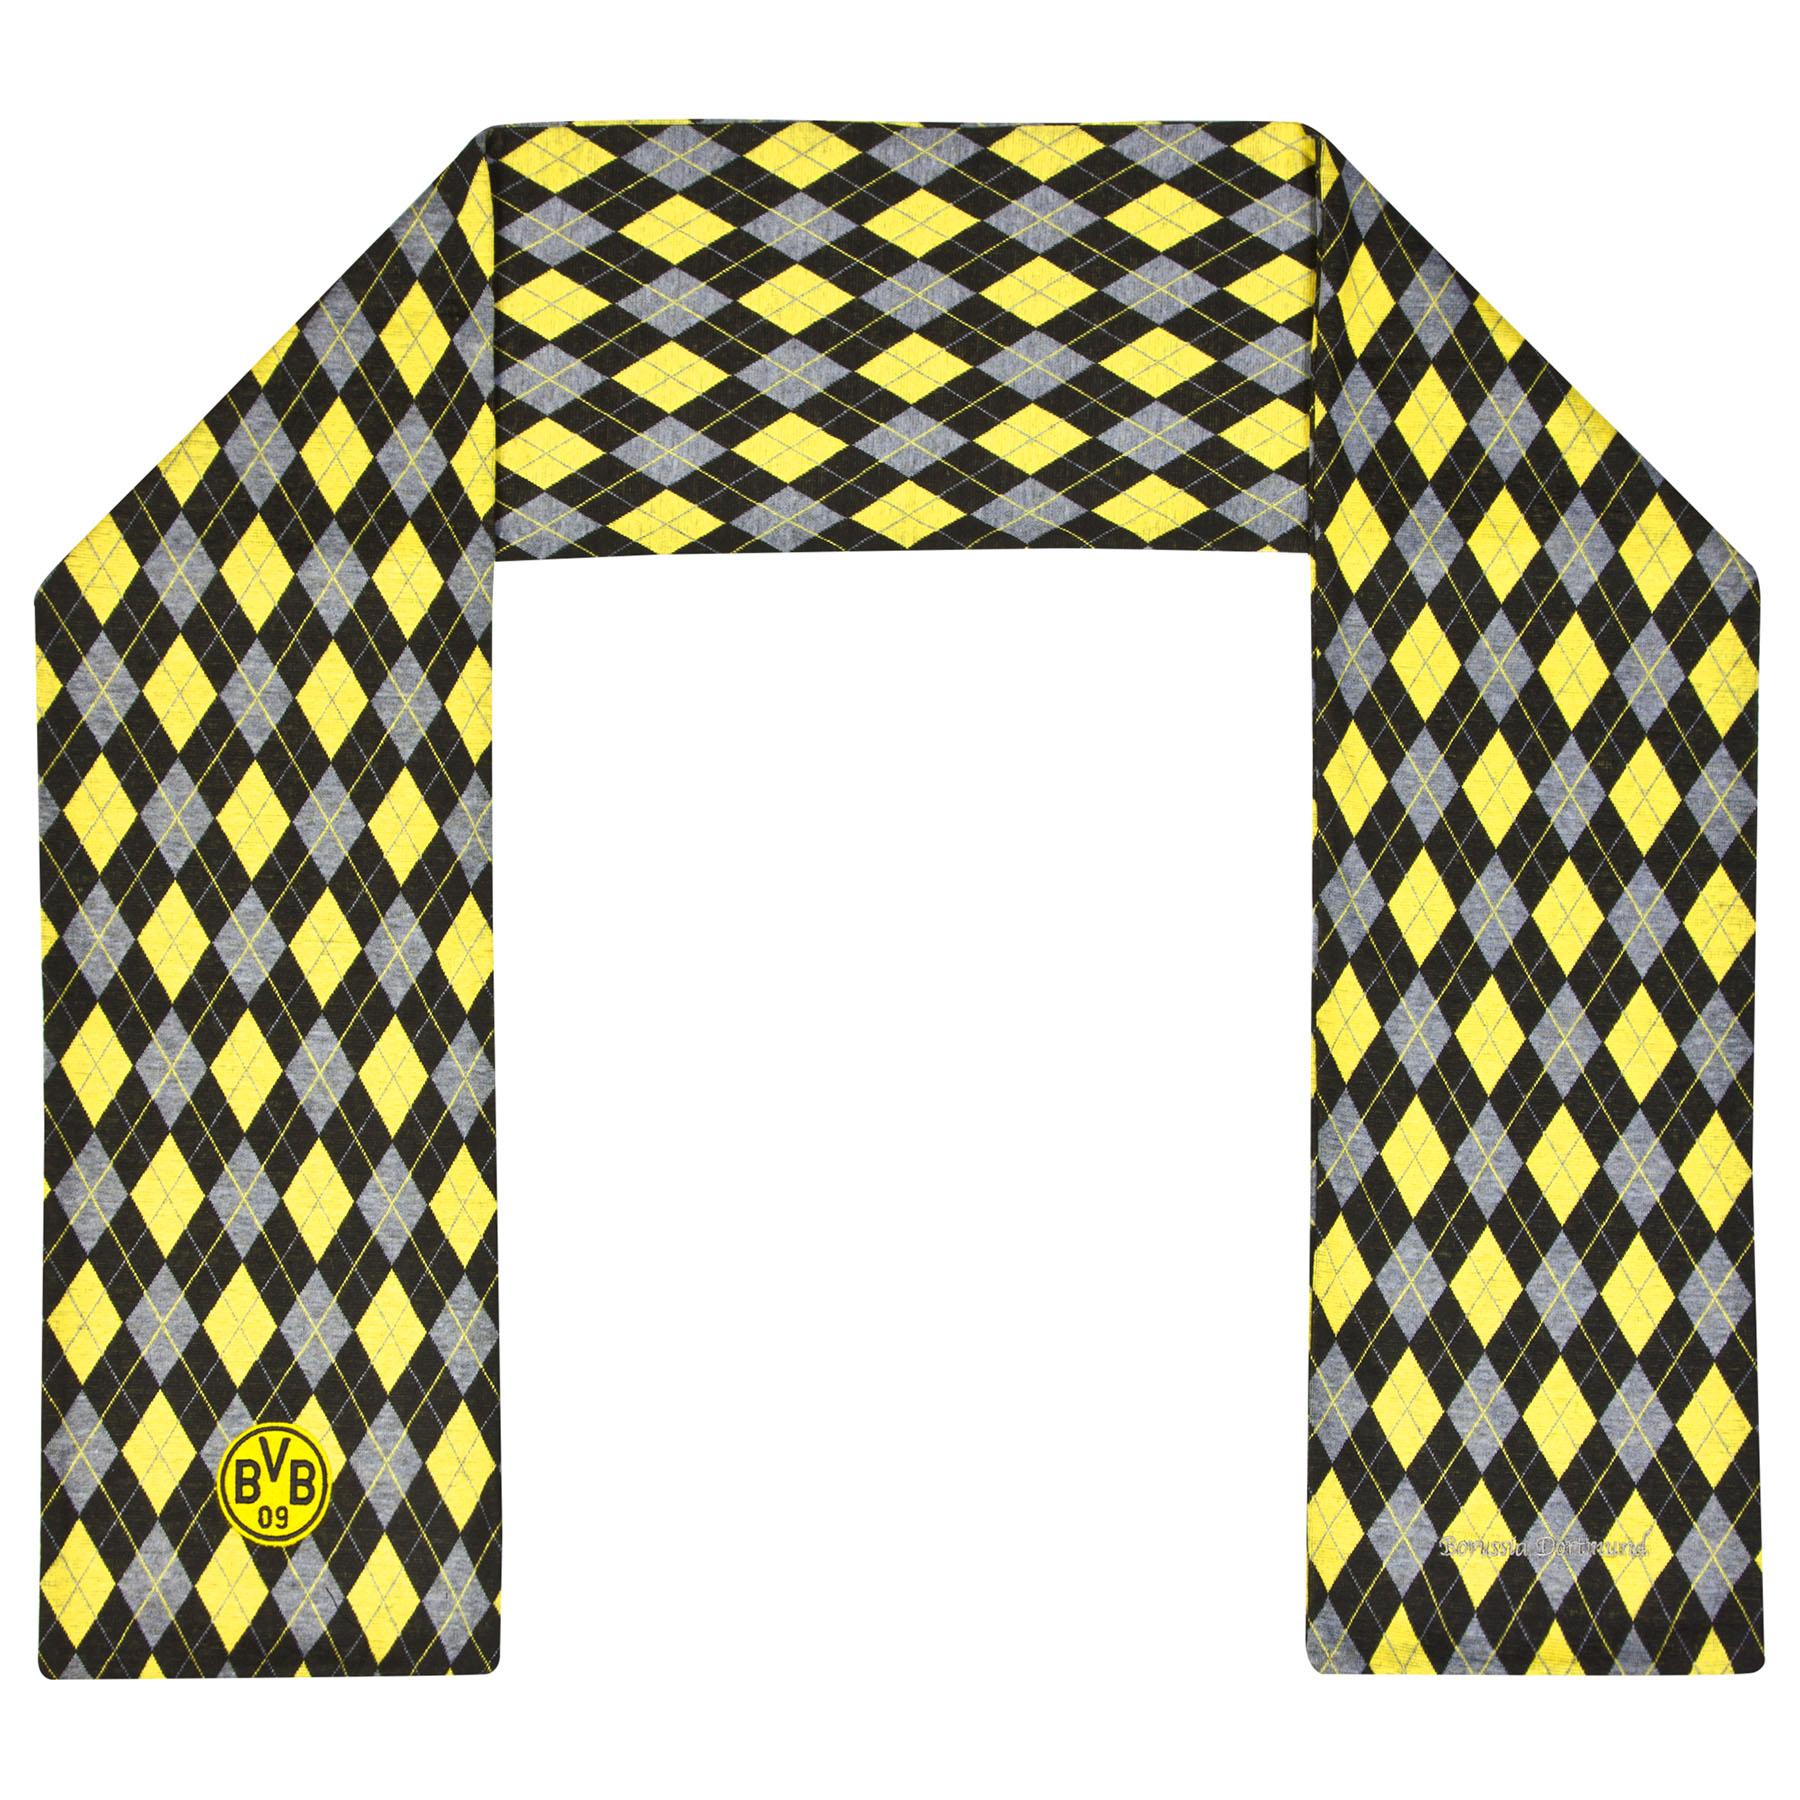 BVB Diamond Fashion Scarf – Black/Yellow